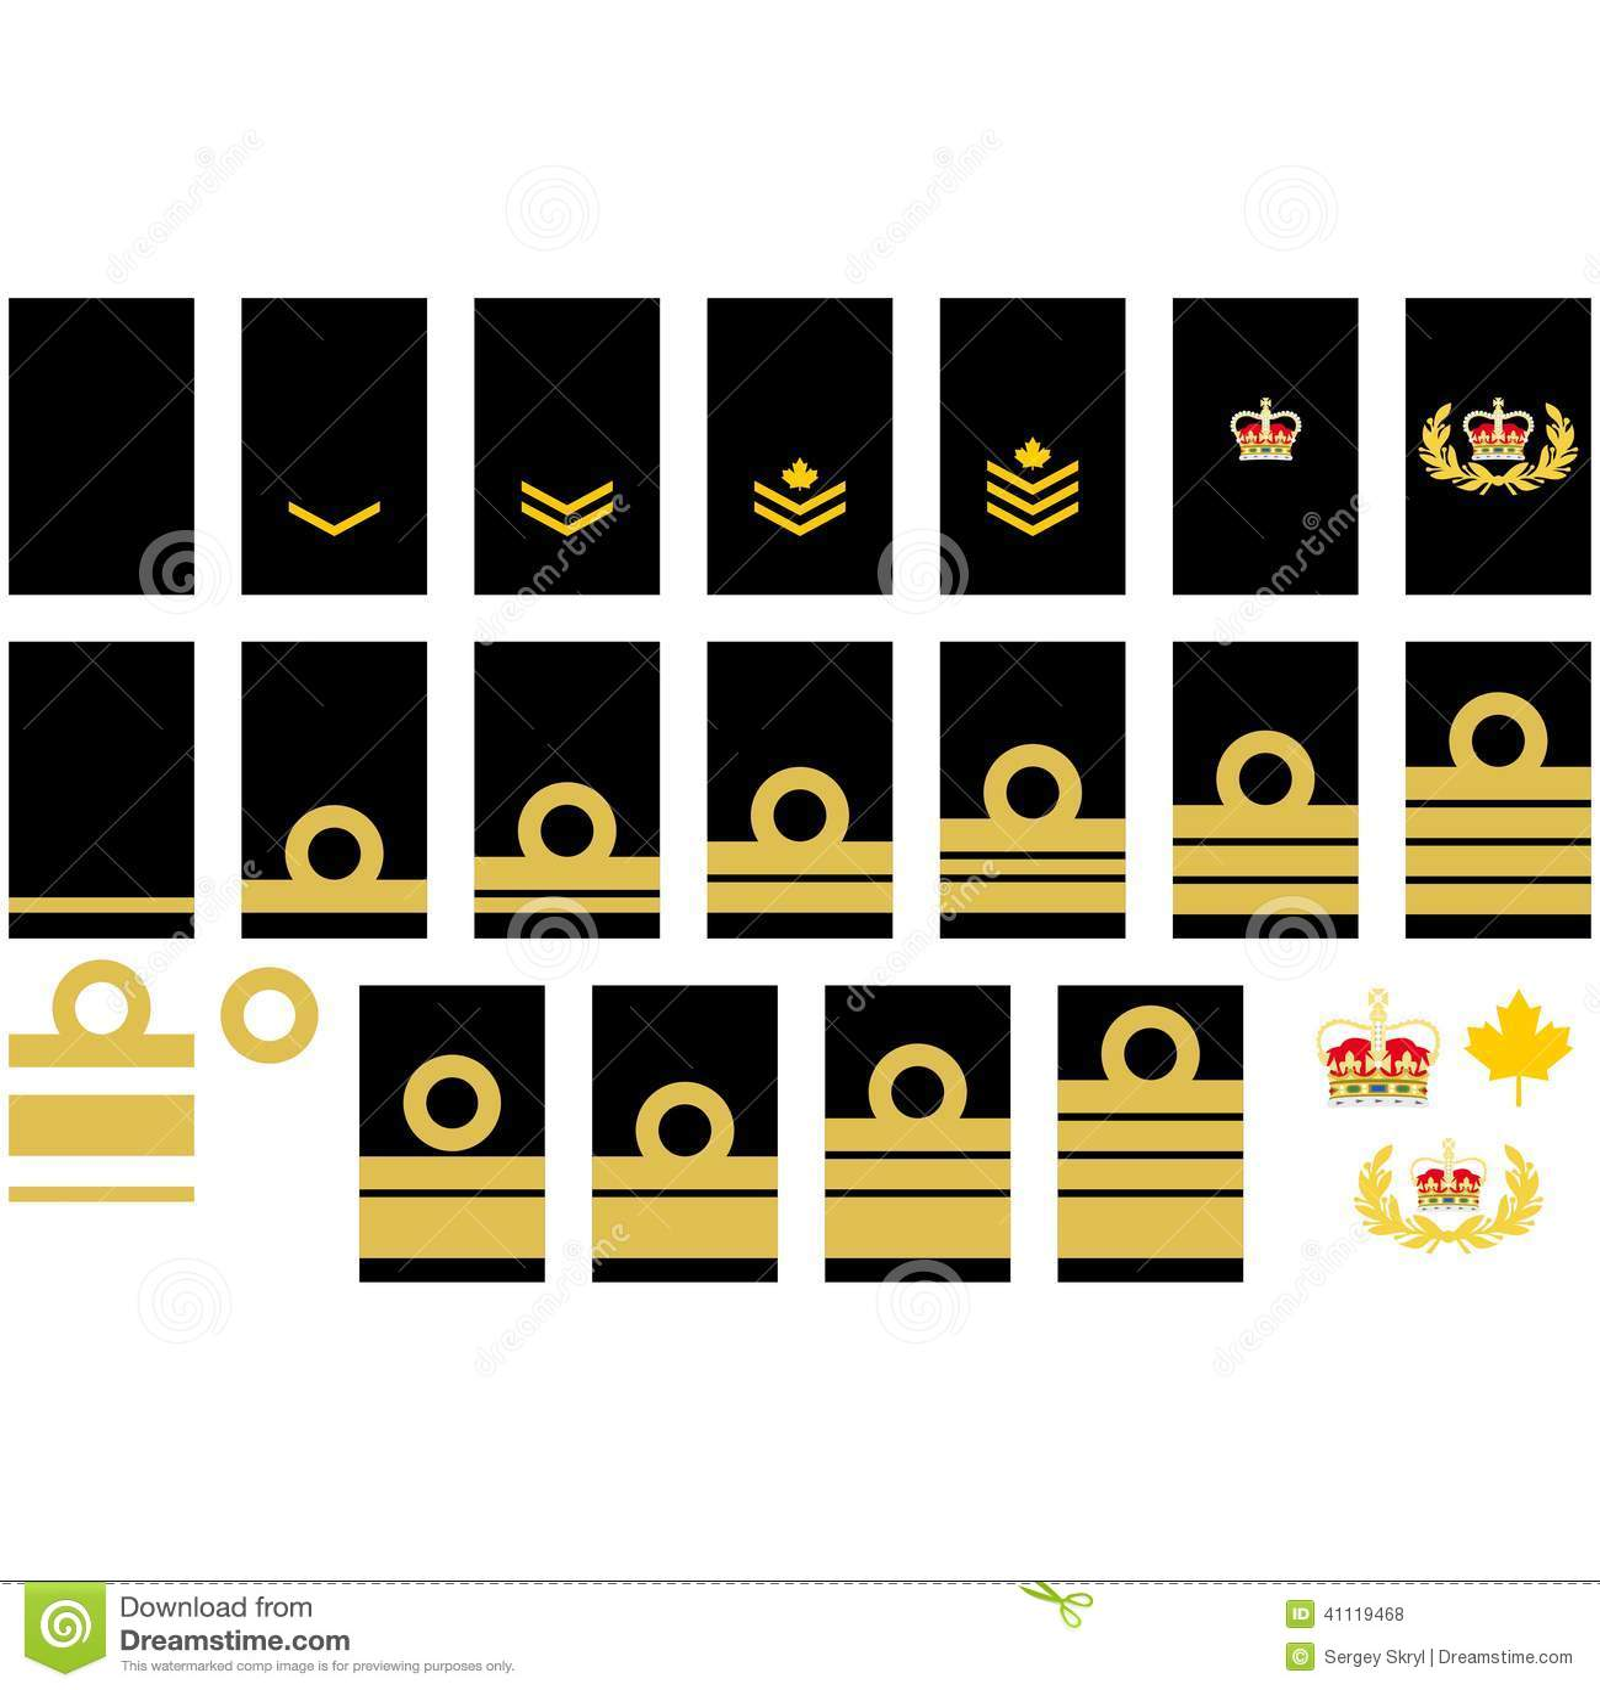 Canadian navy insignia stock vector illustration of item 41119468 canadian navy insignia biocorpaavc Images